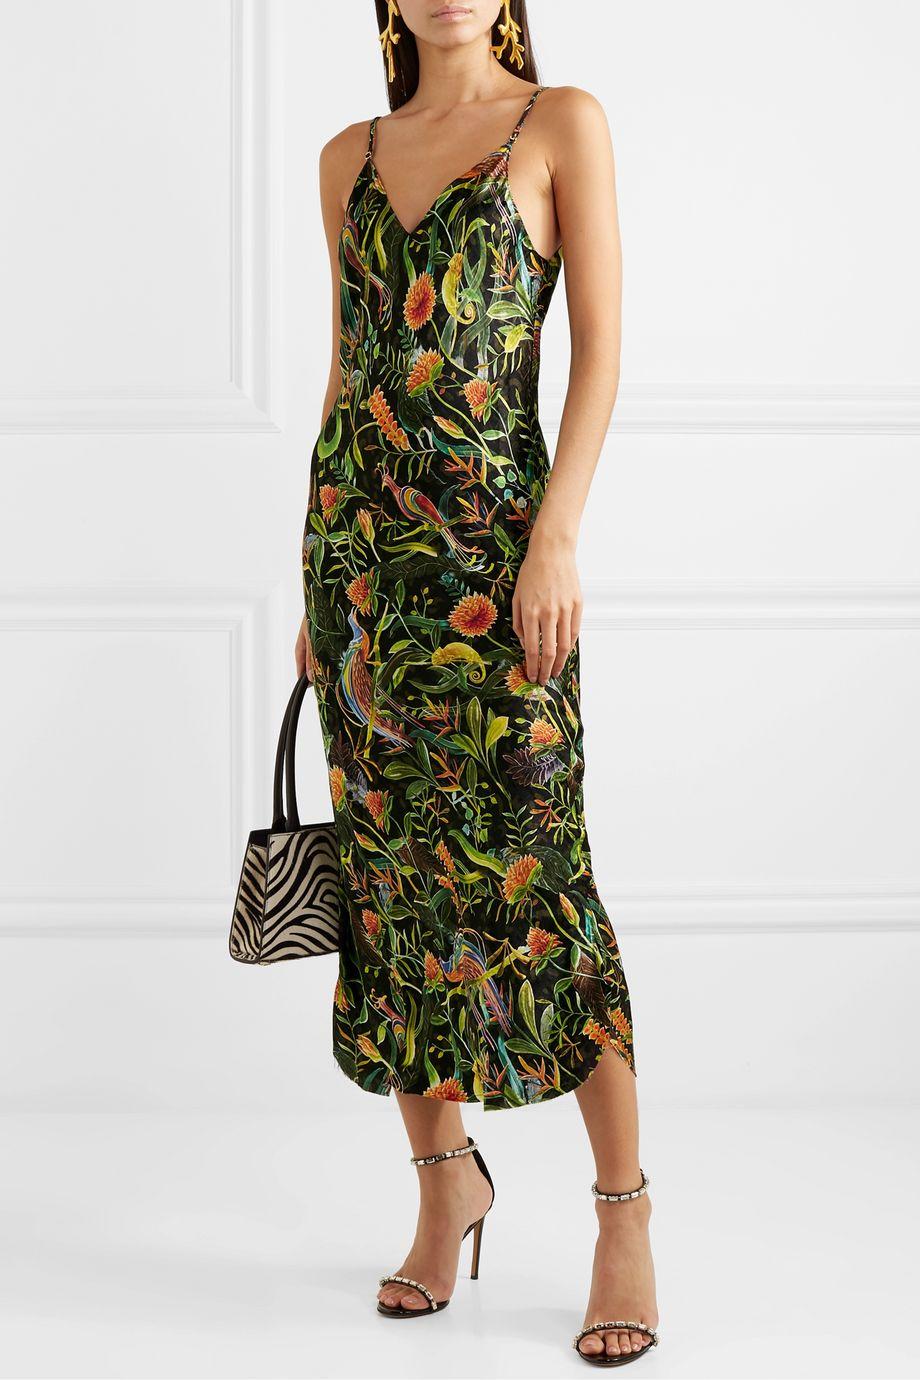 Dodo Bar Or + Annabel's printed silk-jacquard midi dress